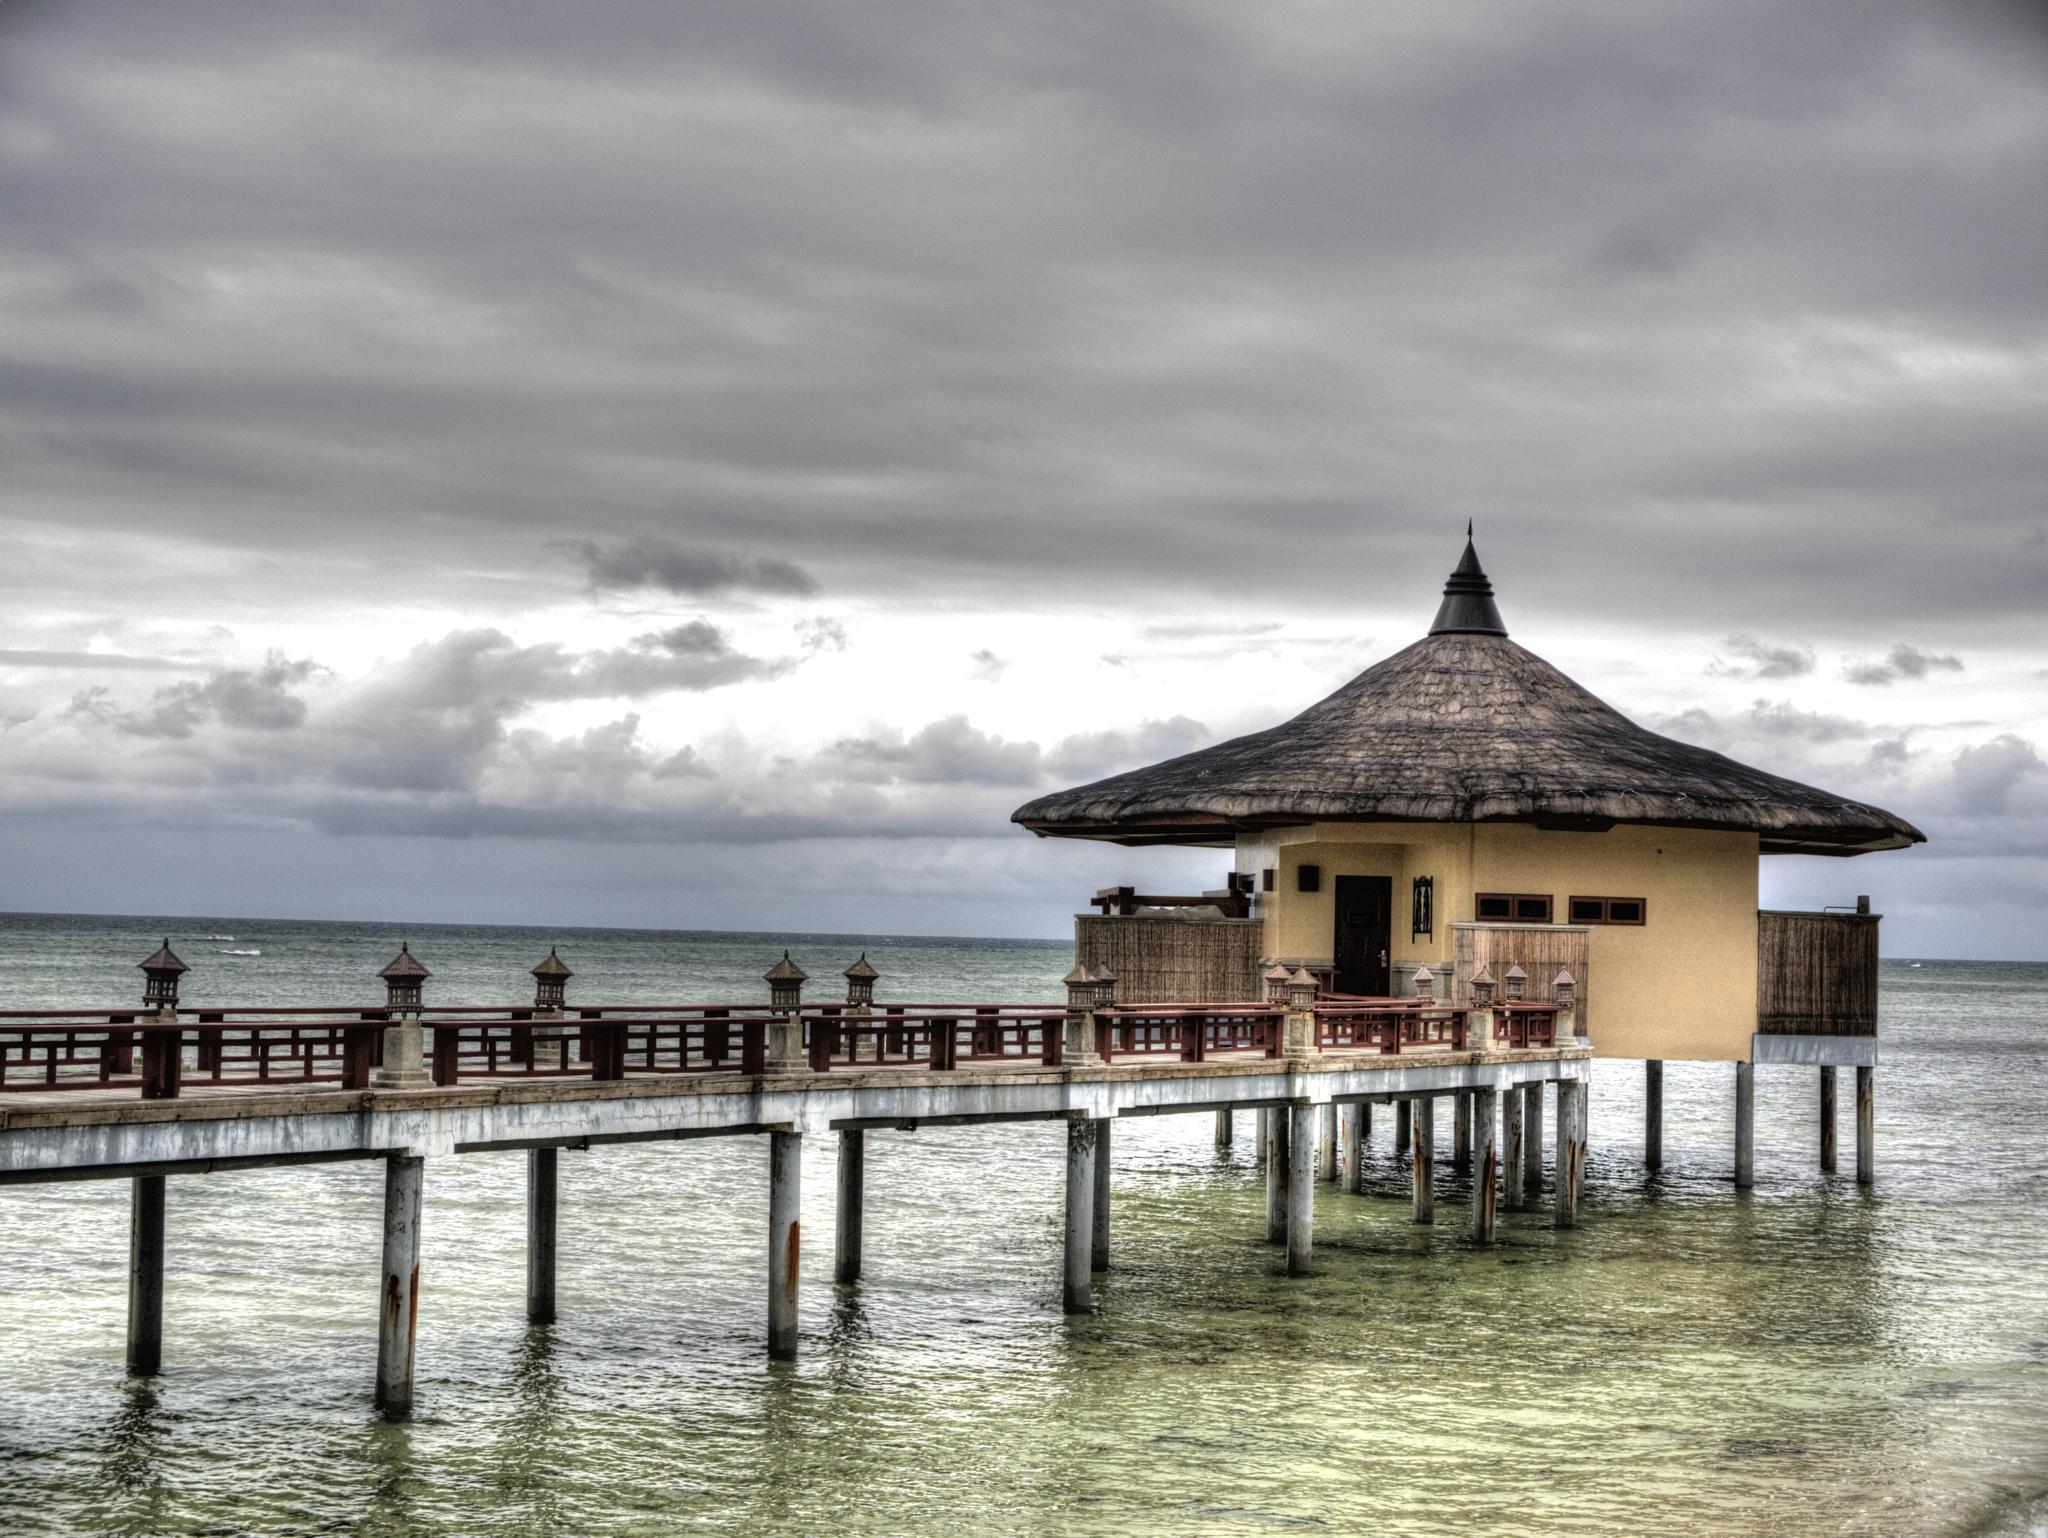 Balesin Beach 5 by Raymund Vasquez